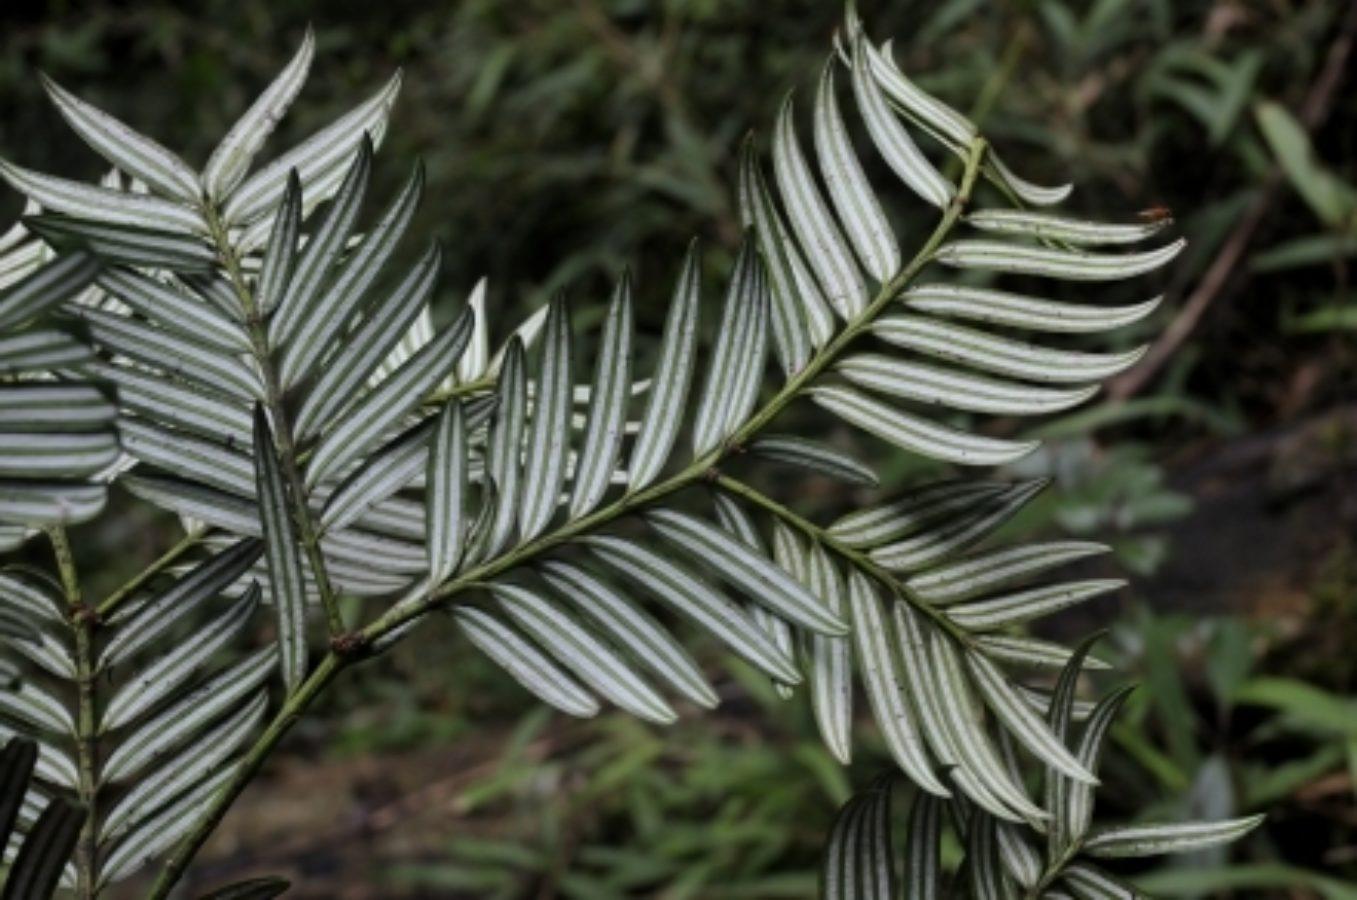 Underside of foliage